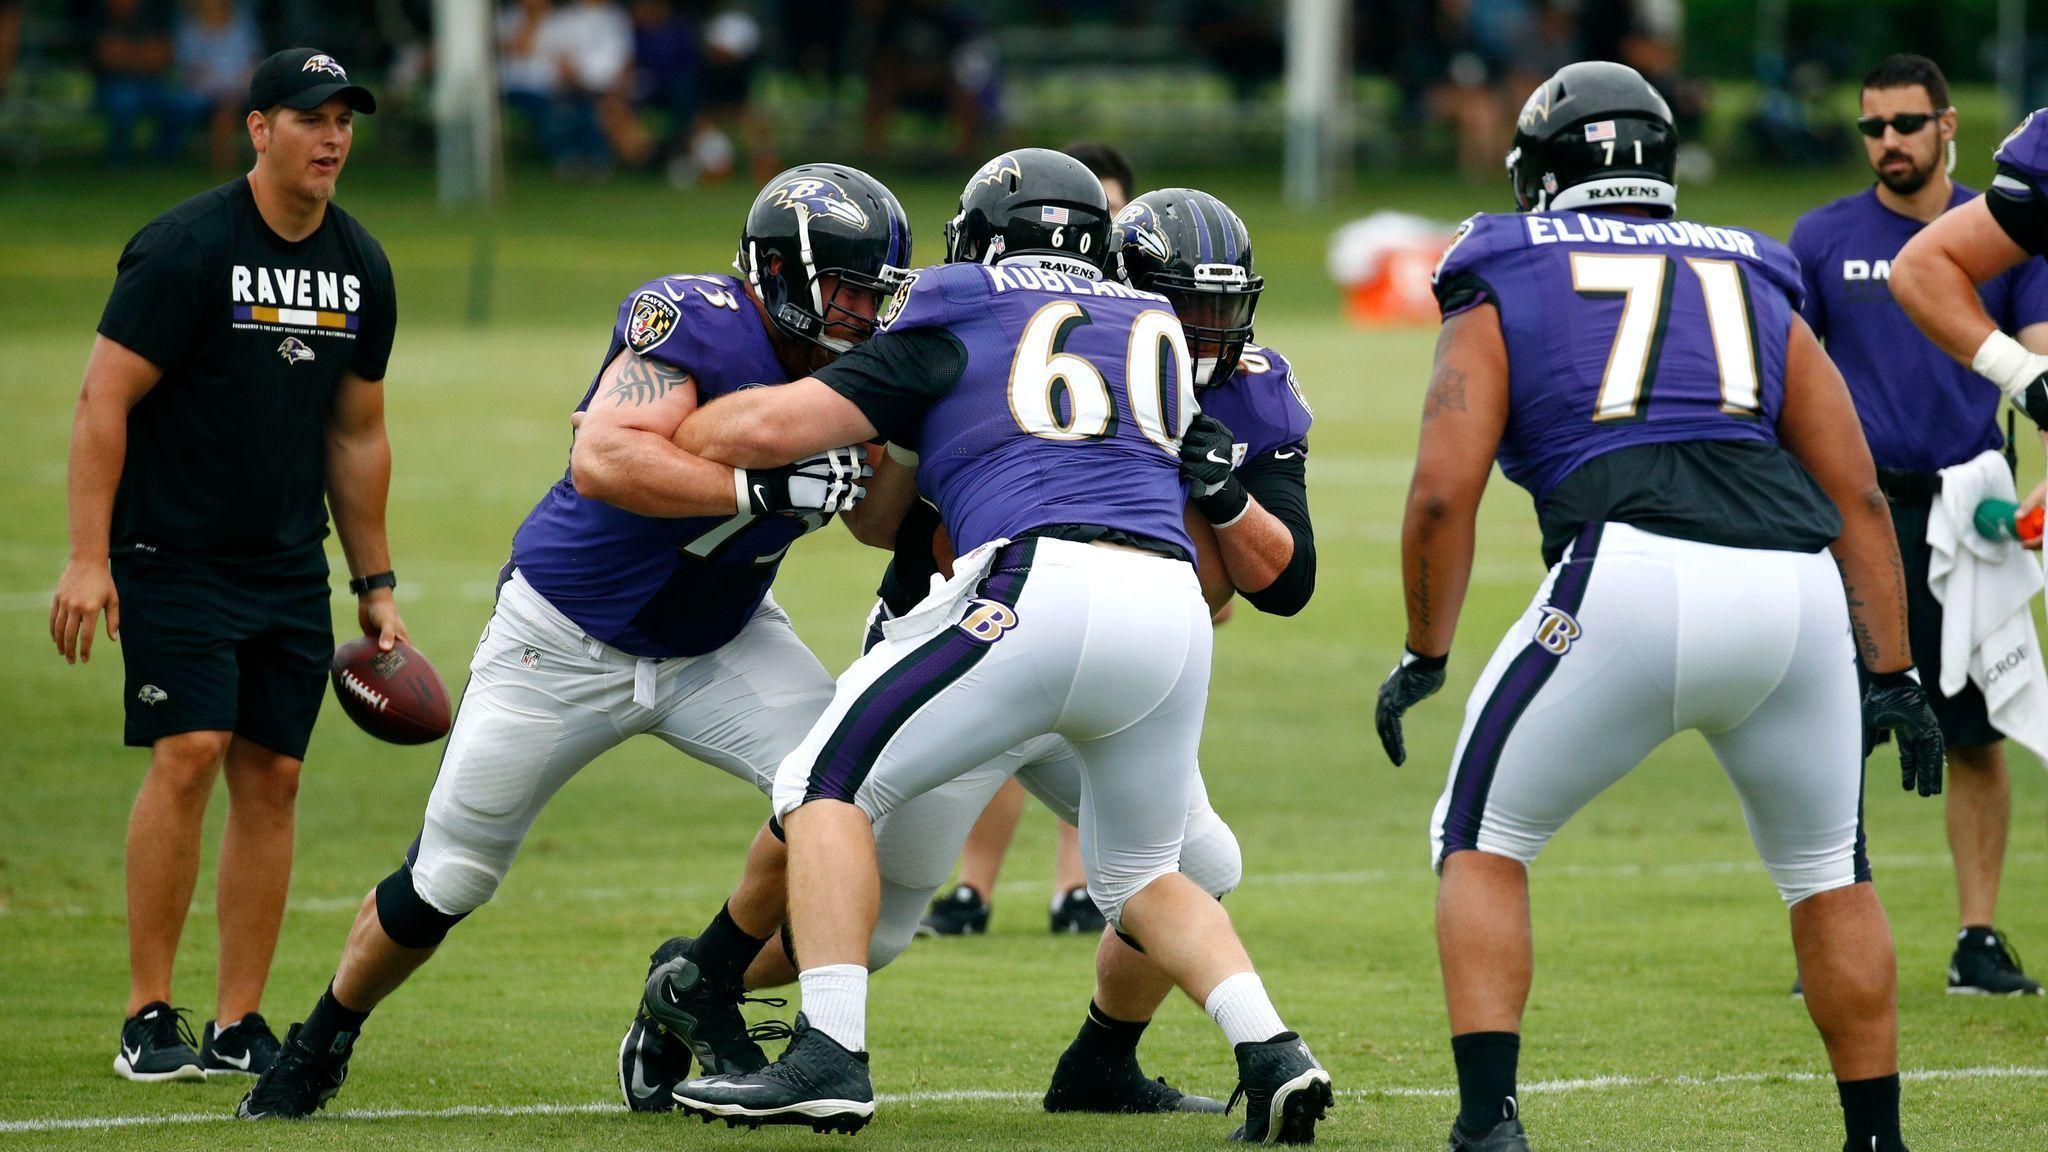 Ravens right guard Marshal Yanda has no problem easing his way